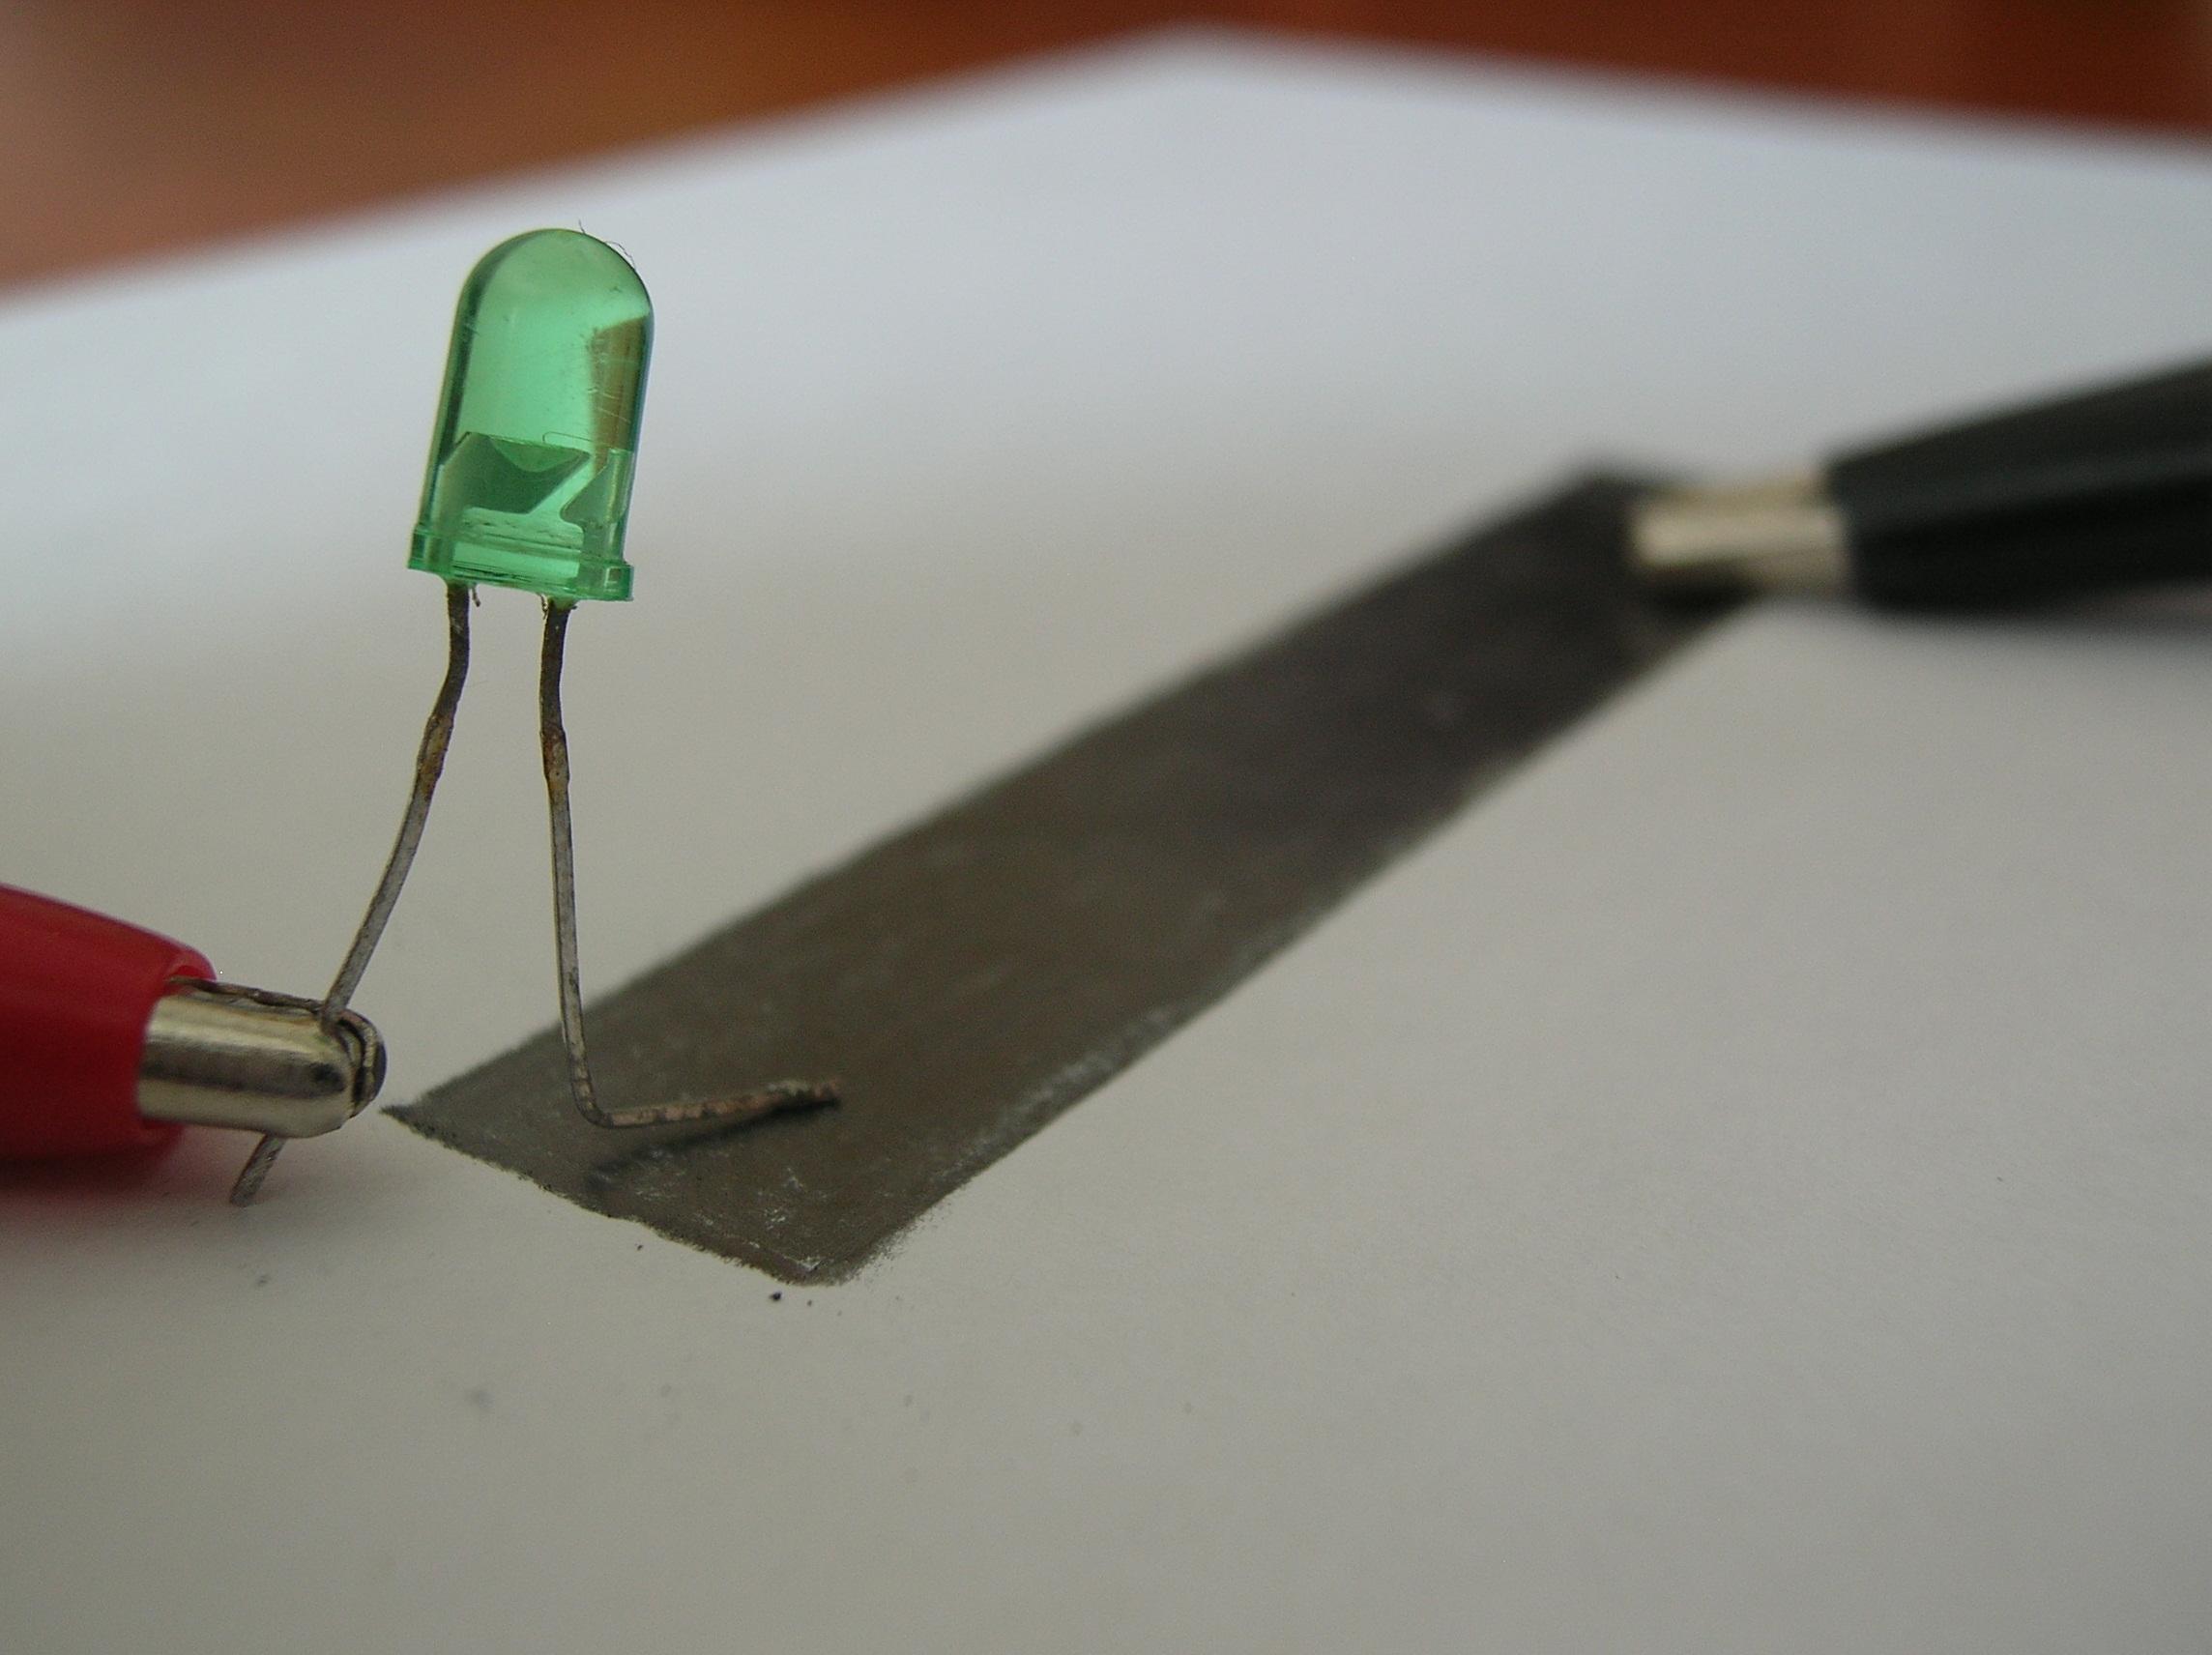 Make a Pencil's Lead Potentiometer (Experimentations)